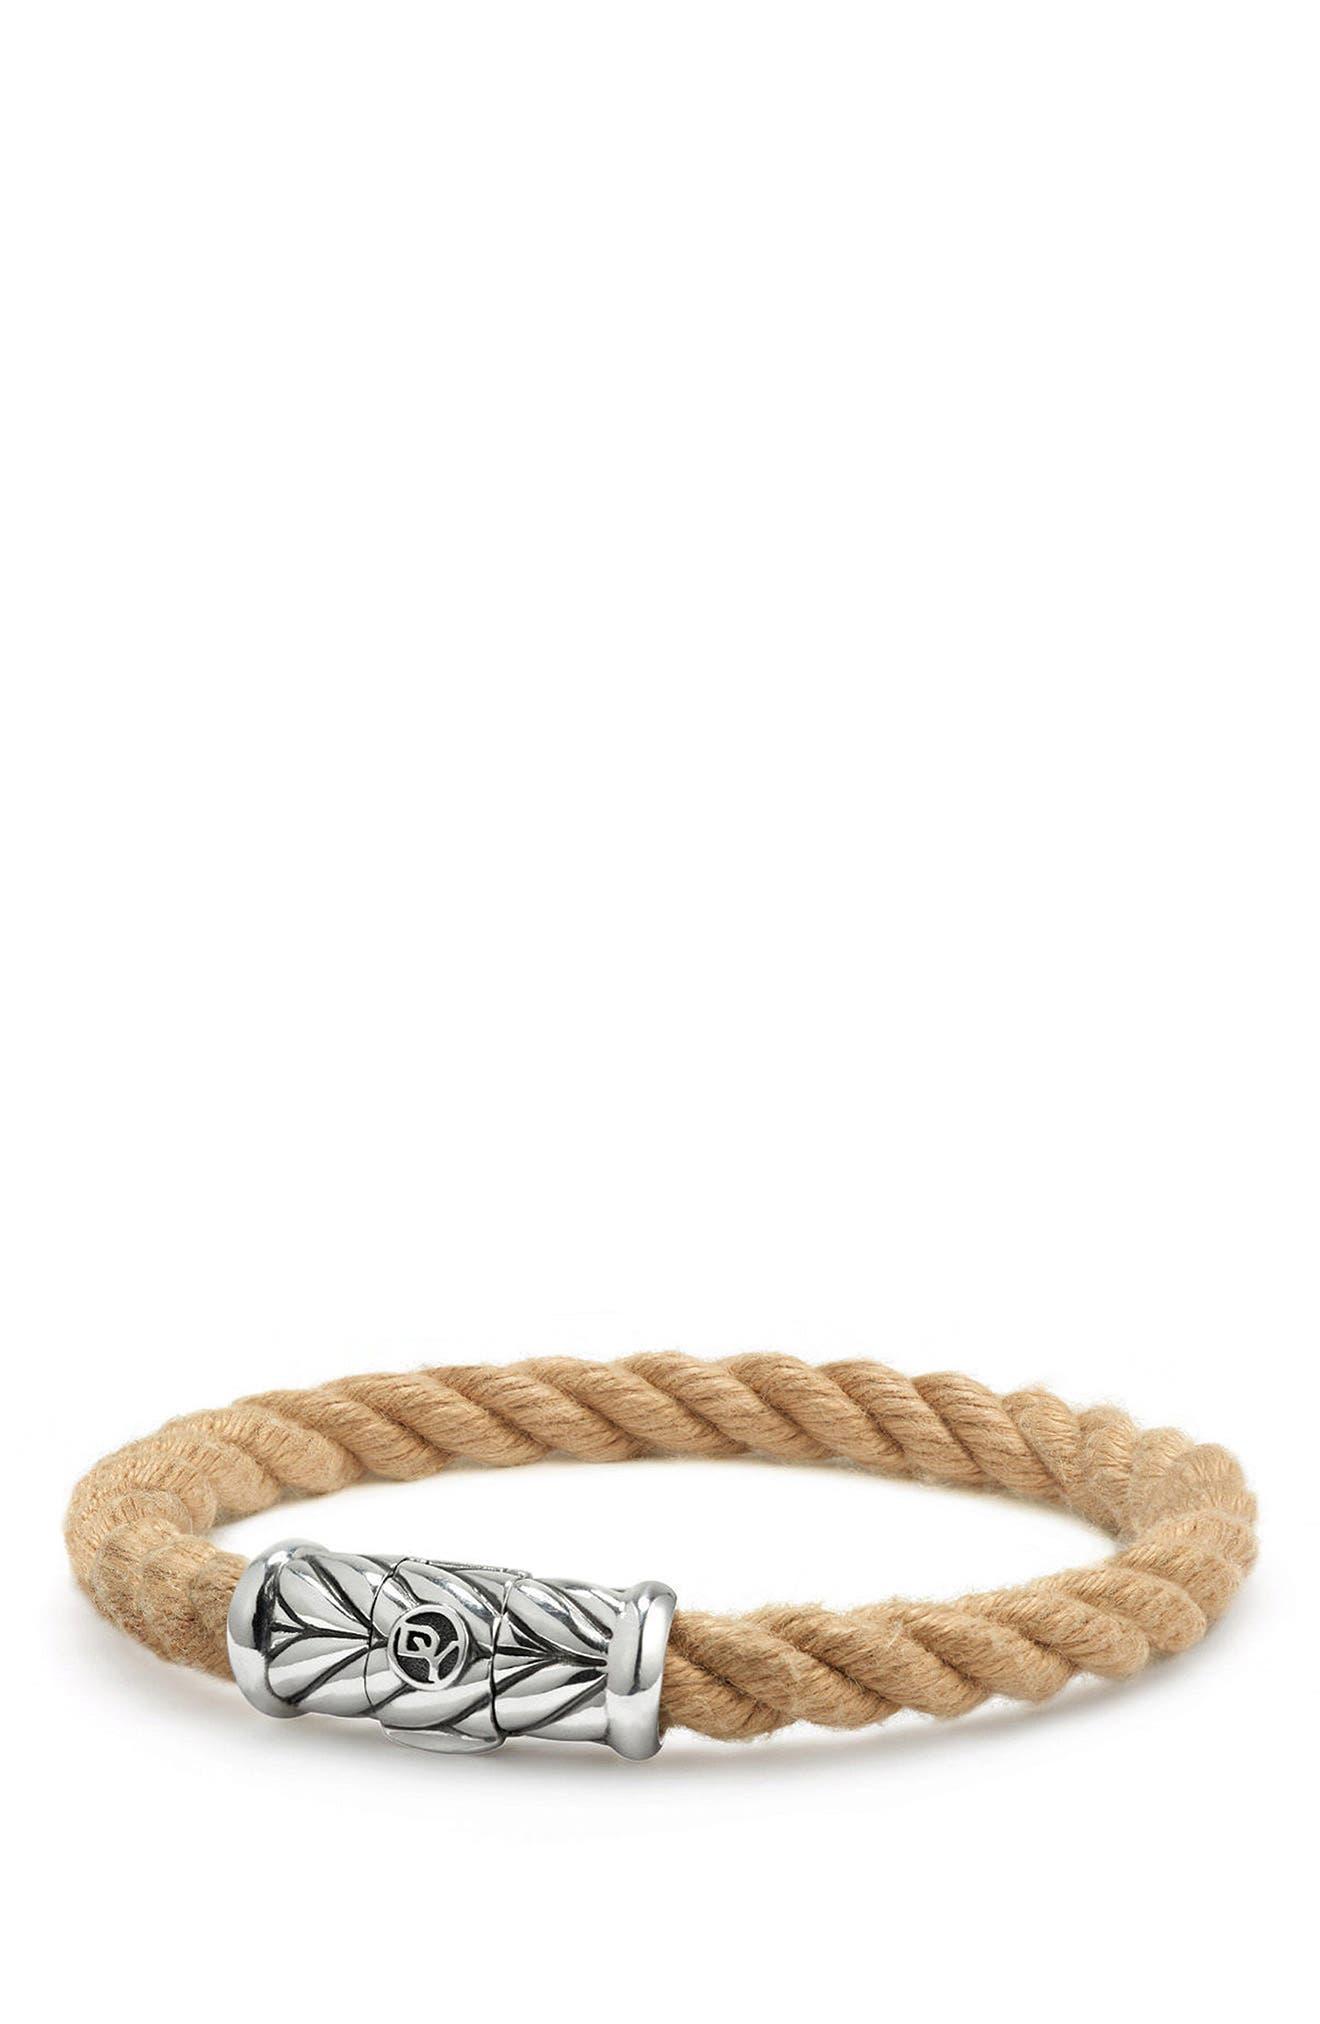 Main Image - David Yurman Maritime Rope Bracelet